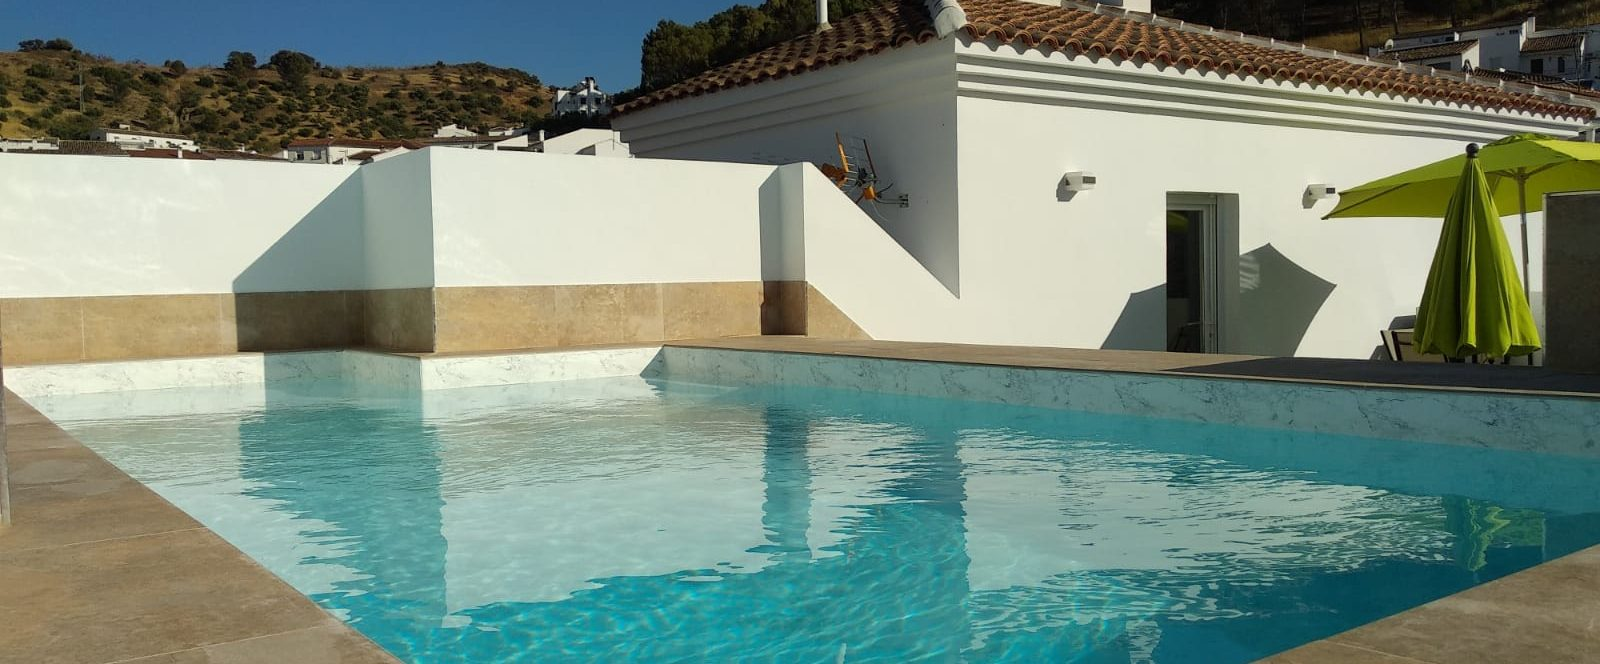 Home - Olvera Properties